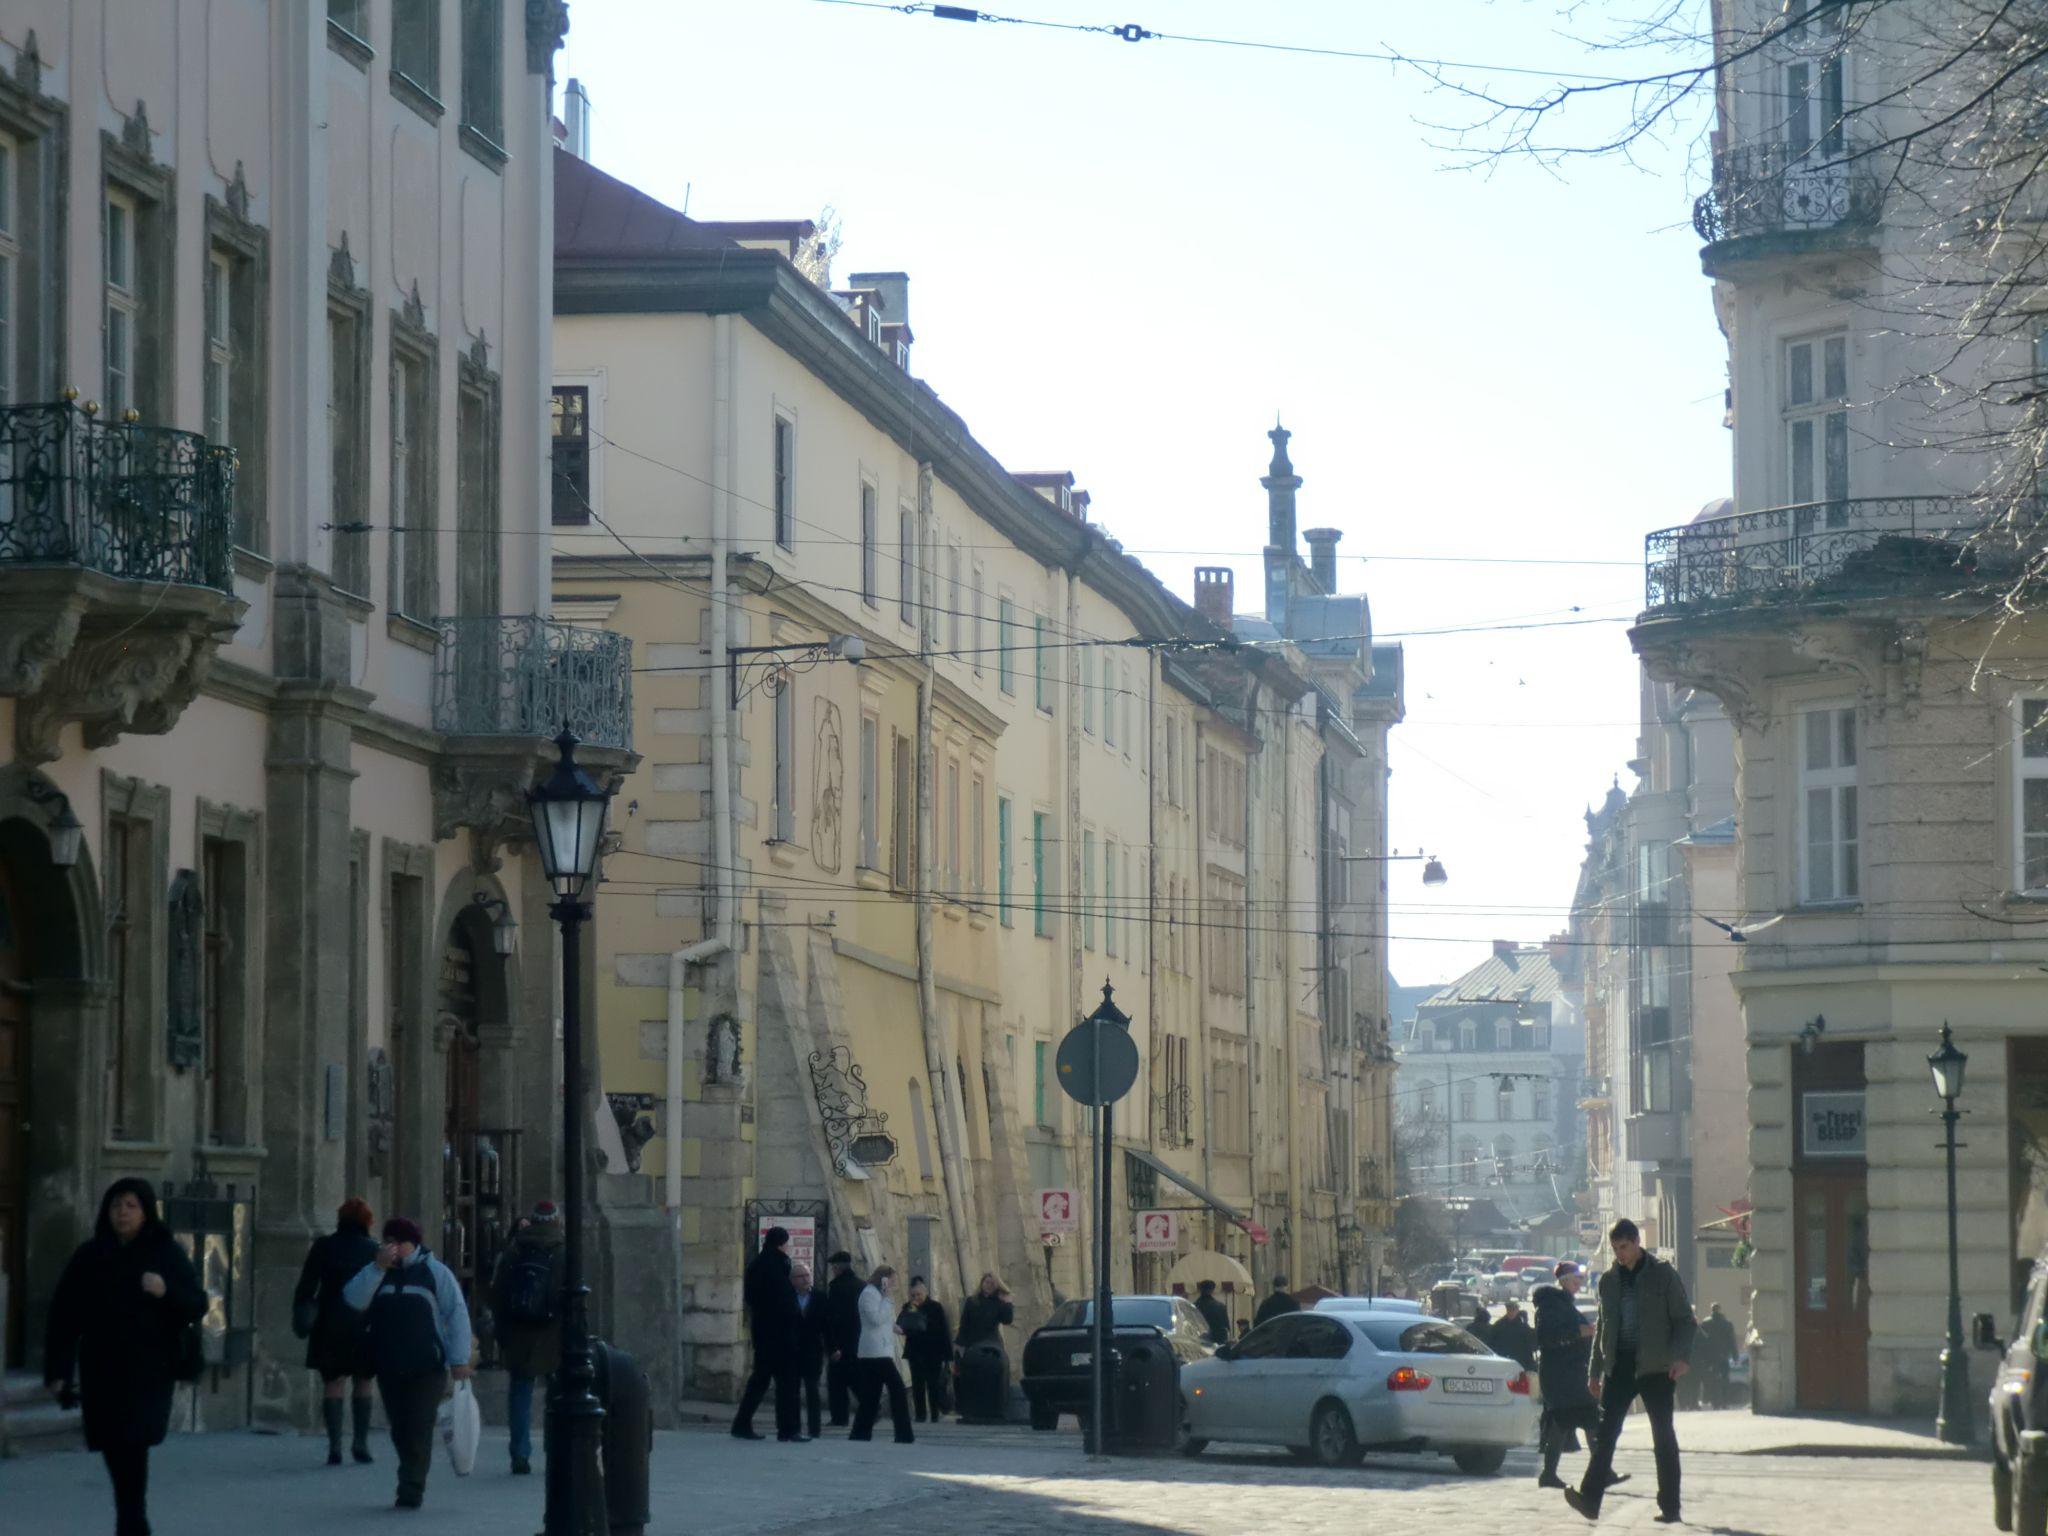 Lviv 25 - Lviv, the Ukrainian pearl